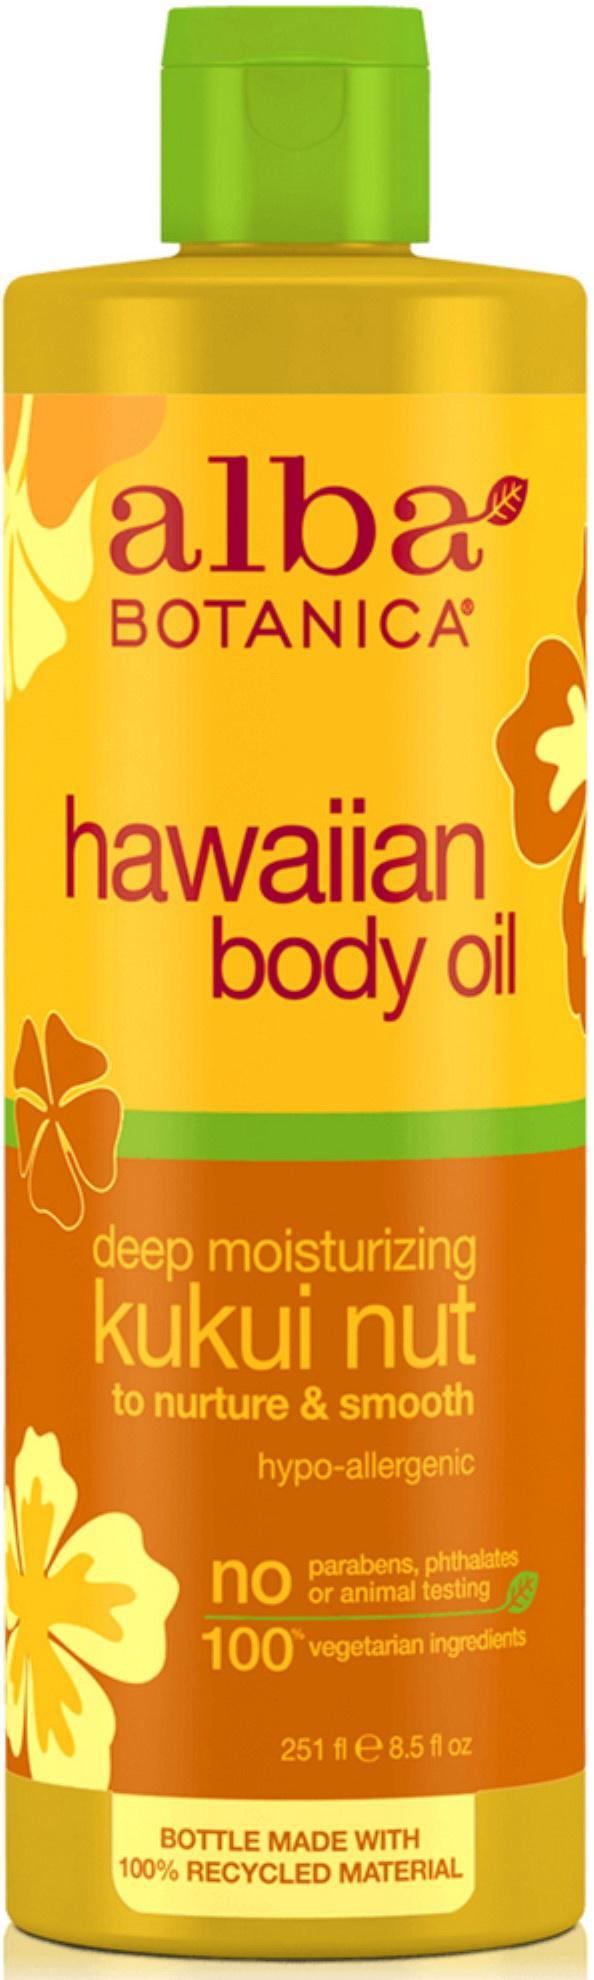 Alba Botanica Hawaiian Body Oil Deep Moisturizing Kukui Nut